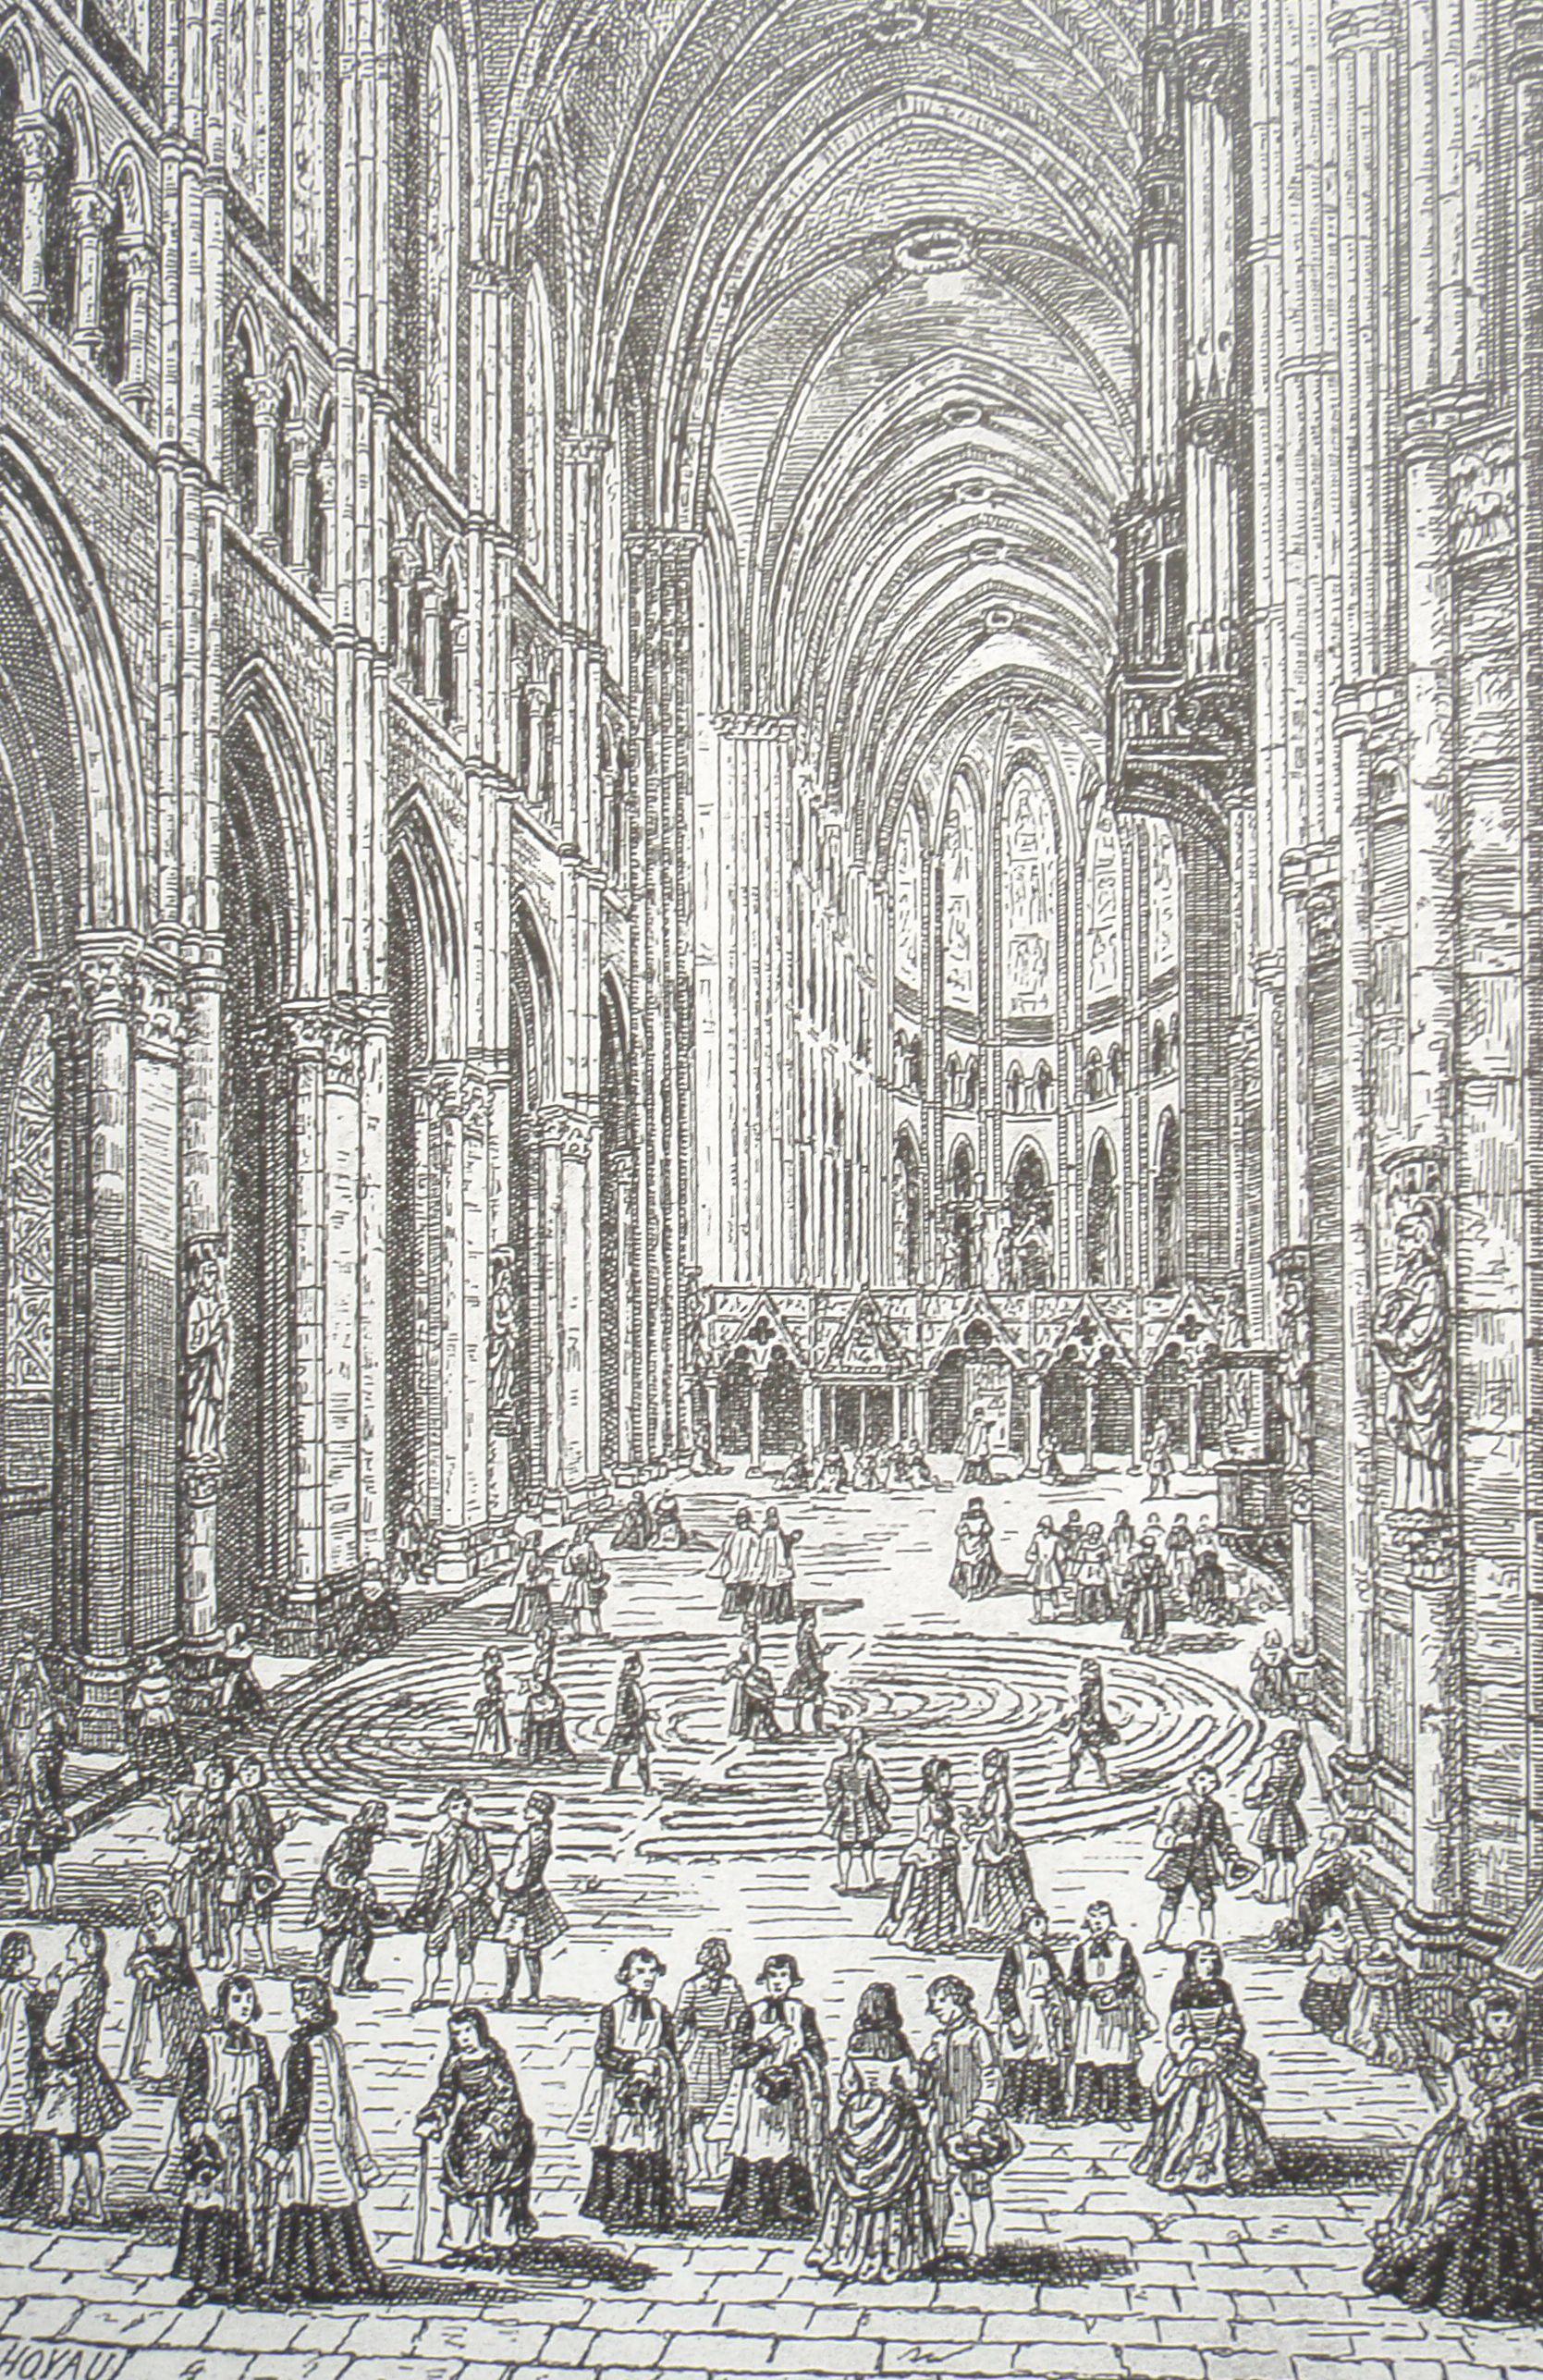 https://i0.wp.com/upload.wikimedia.org/wikipedia/commons/2/20/Inneres_der_Kathedrale.jpg